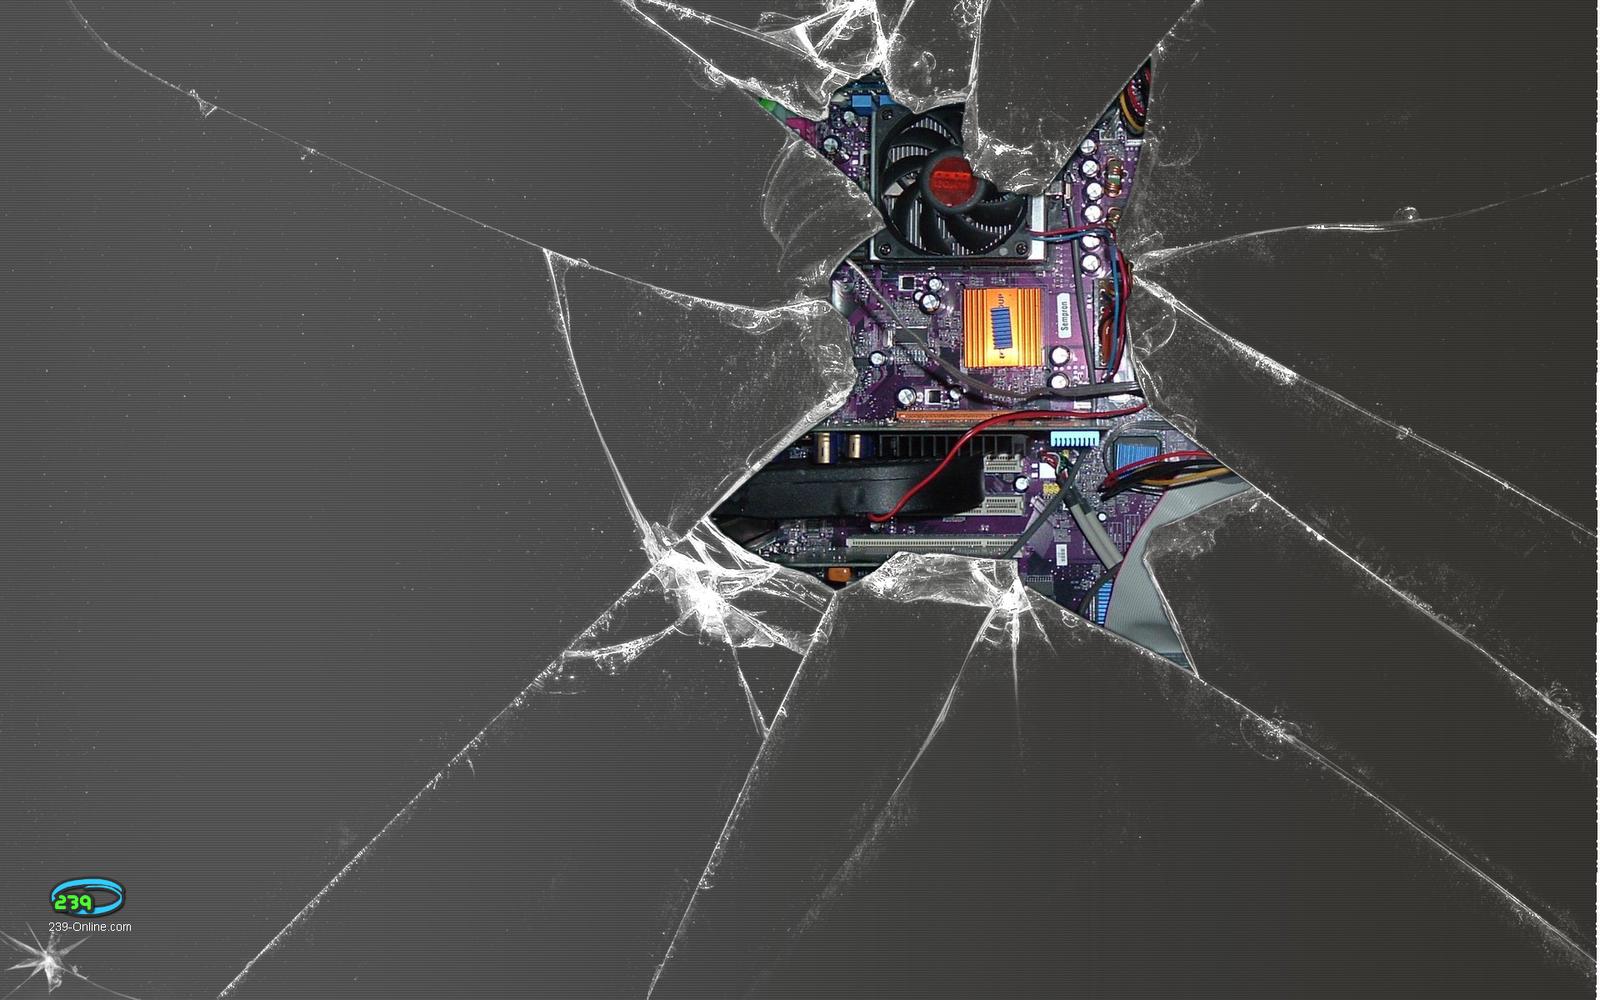 44 Iron Man Broken Screen Wallpaper On Wallpapersafari